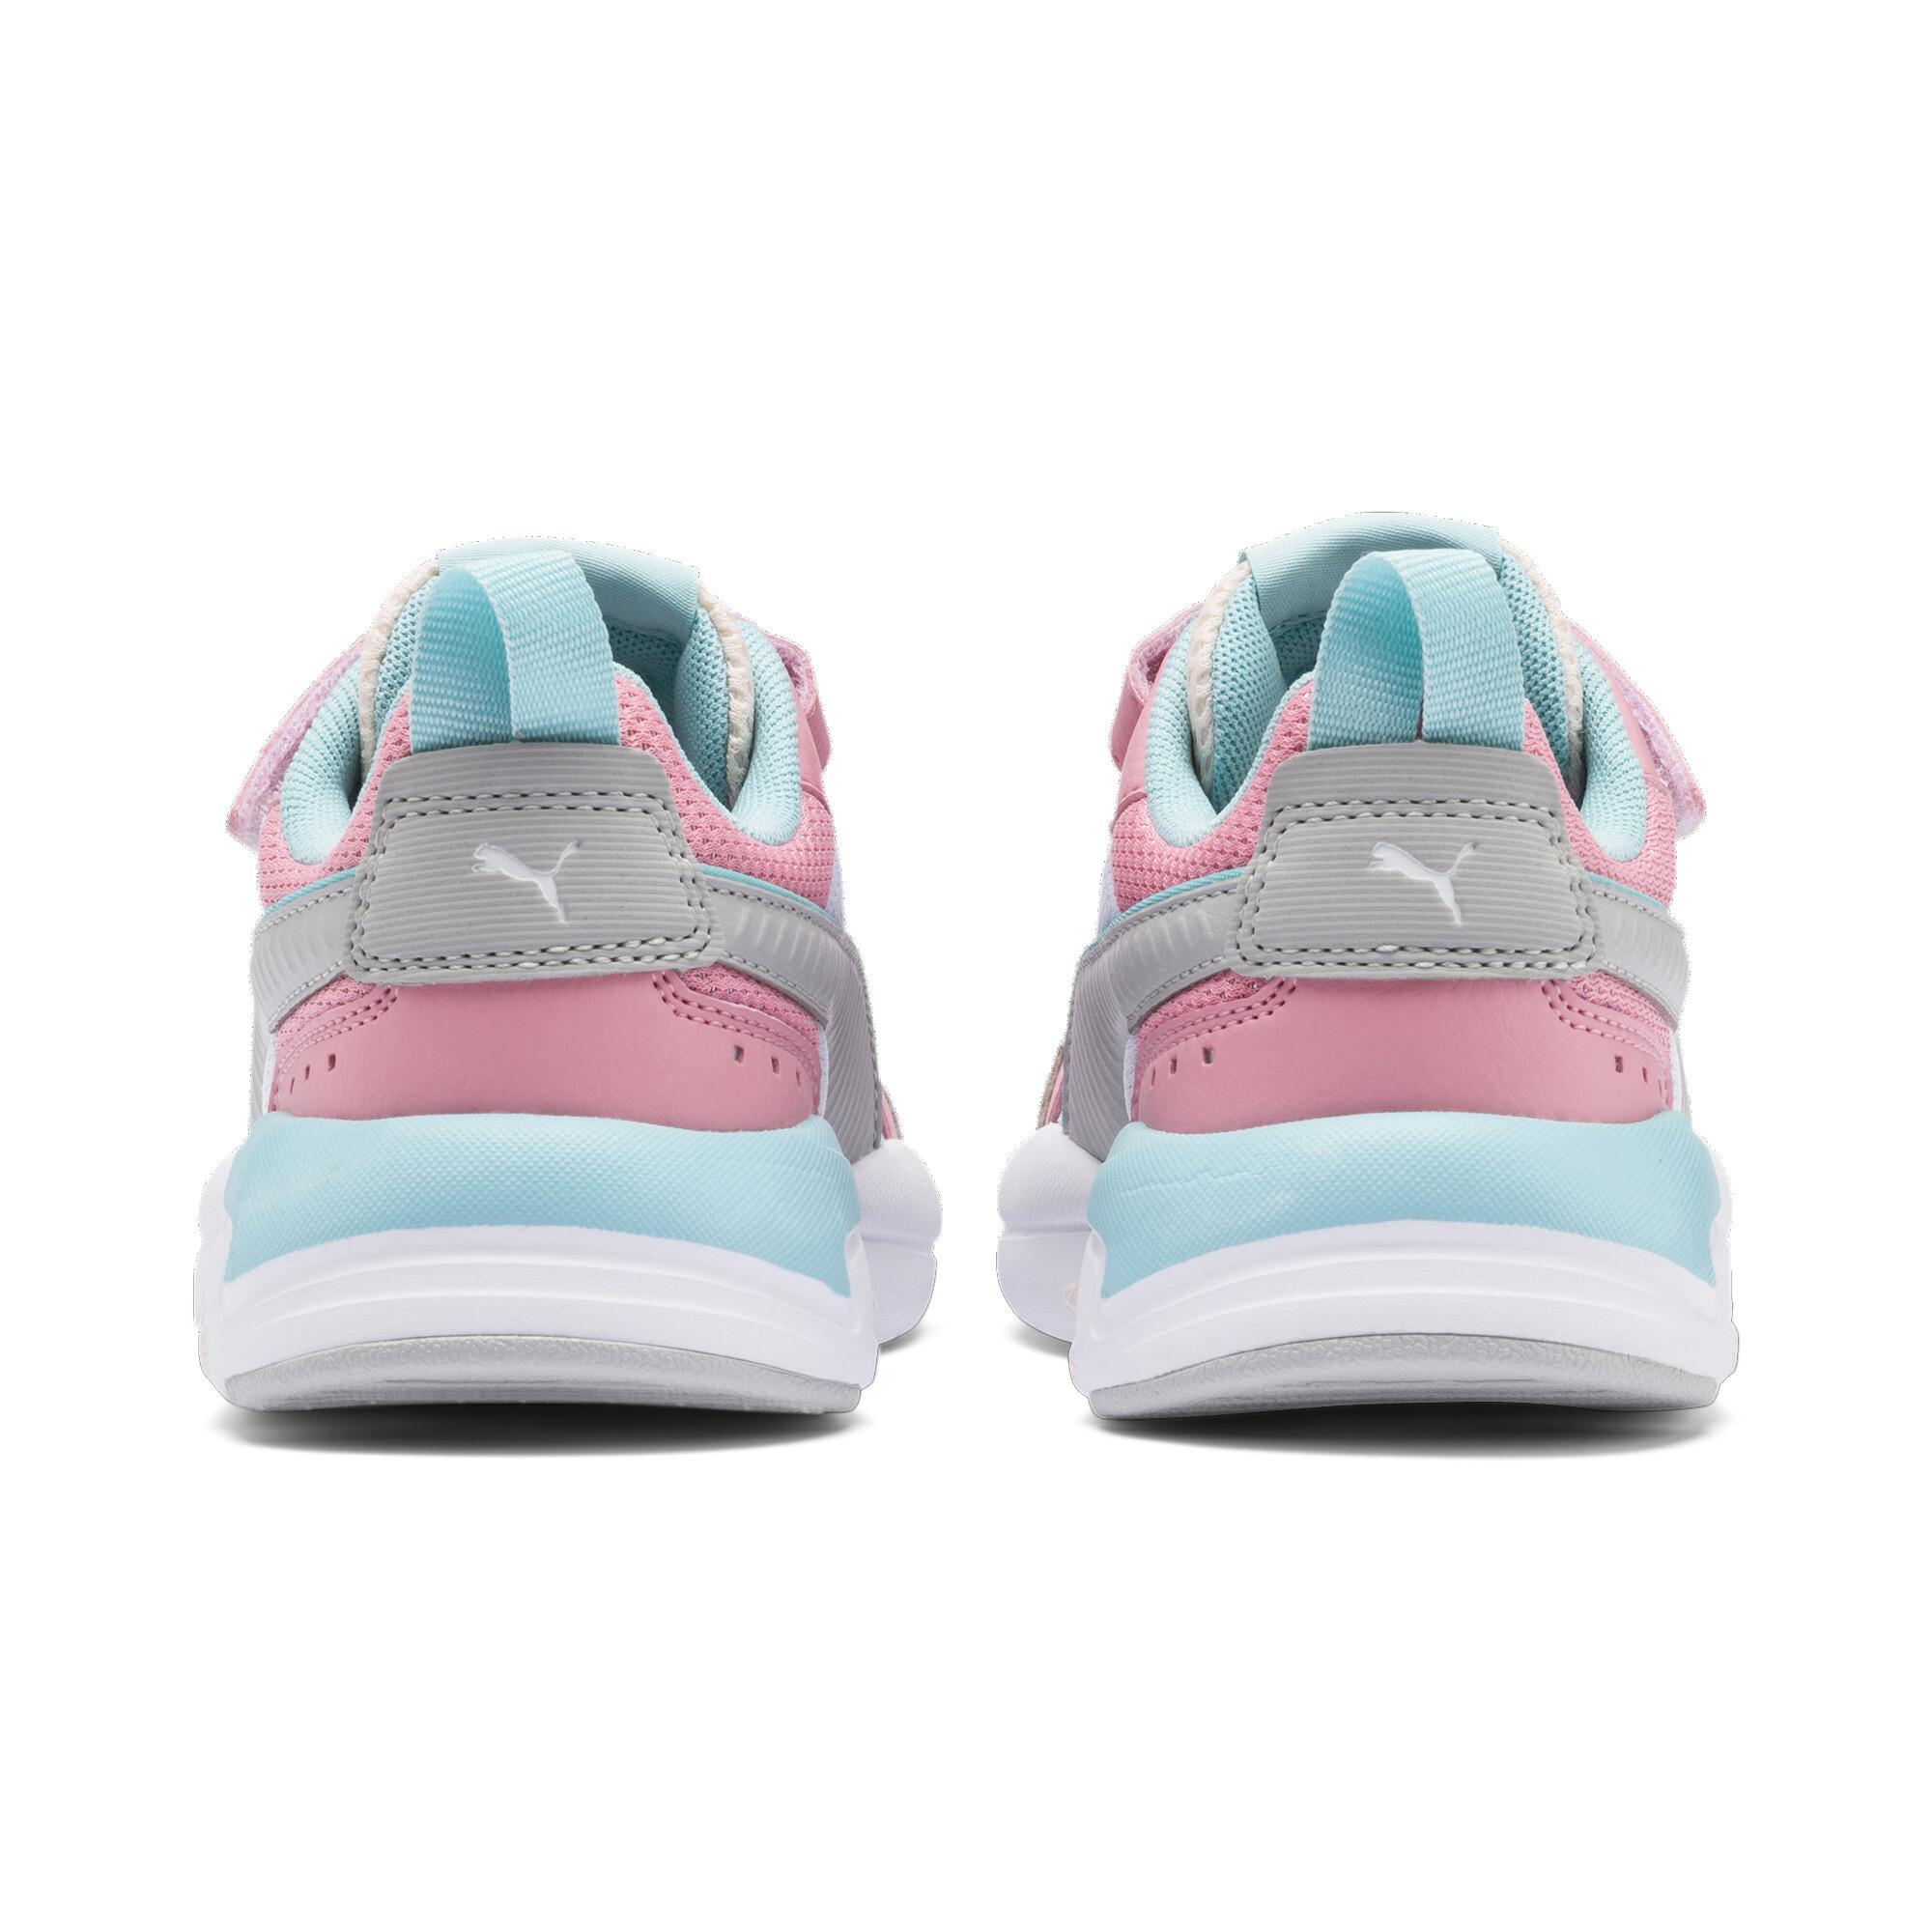 PUMA-X-RAY-Little-Kids-039-Shoes-Kids-Shoe-Kids thumbnail 3